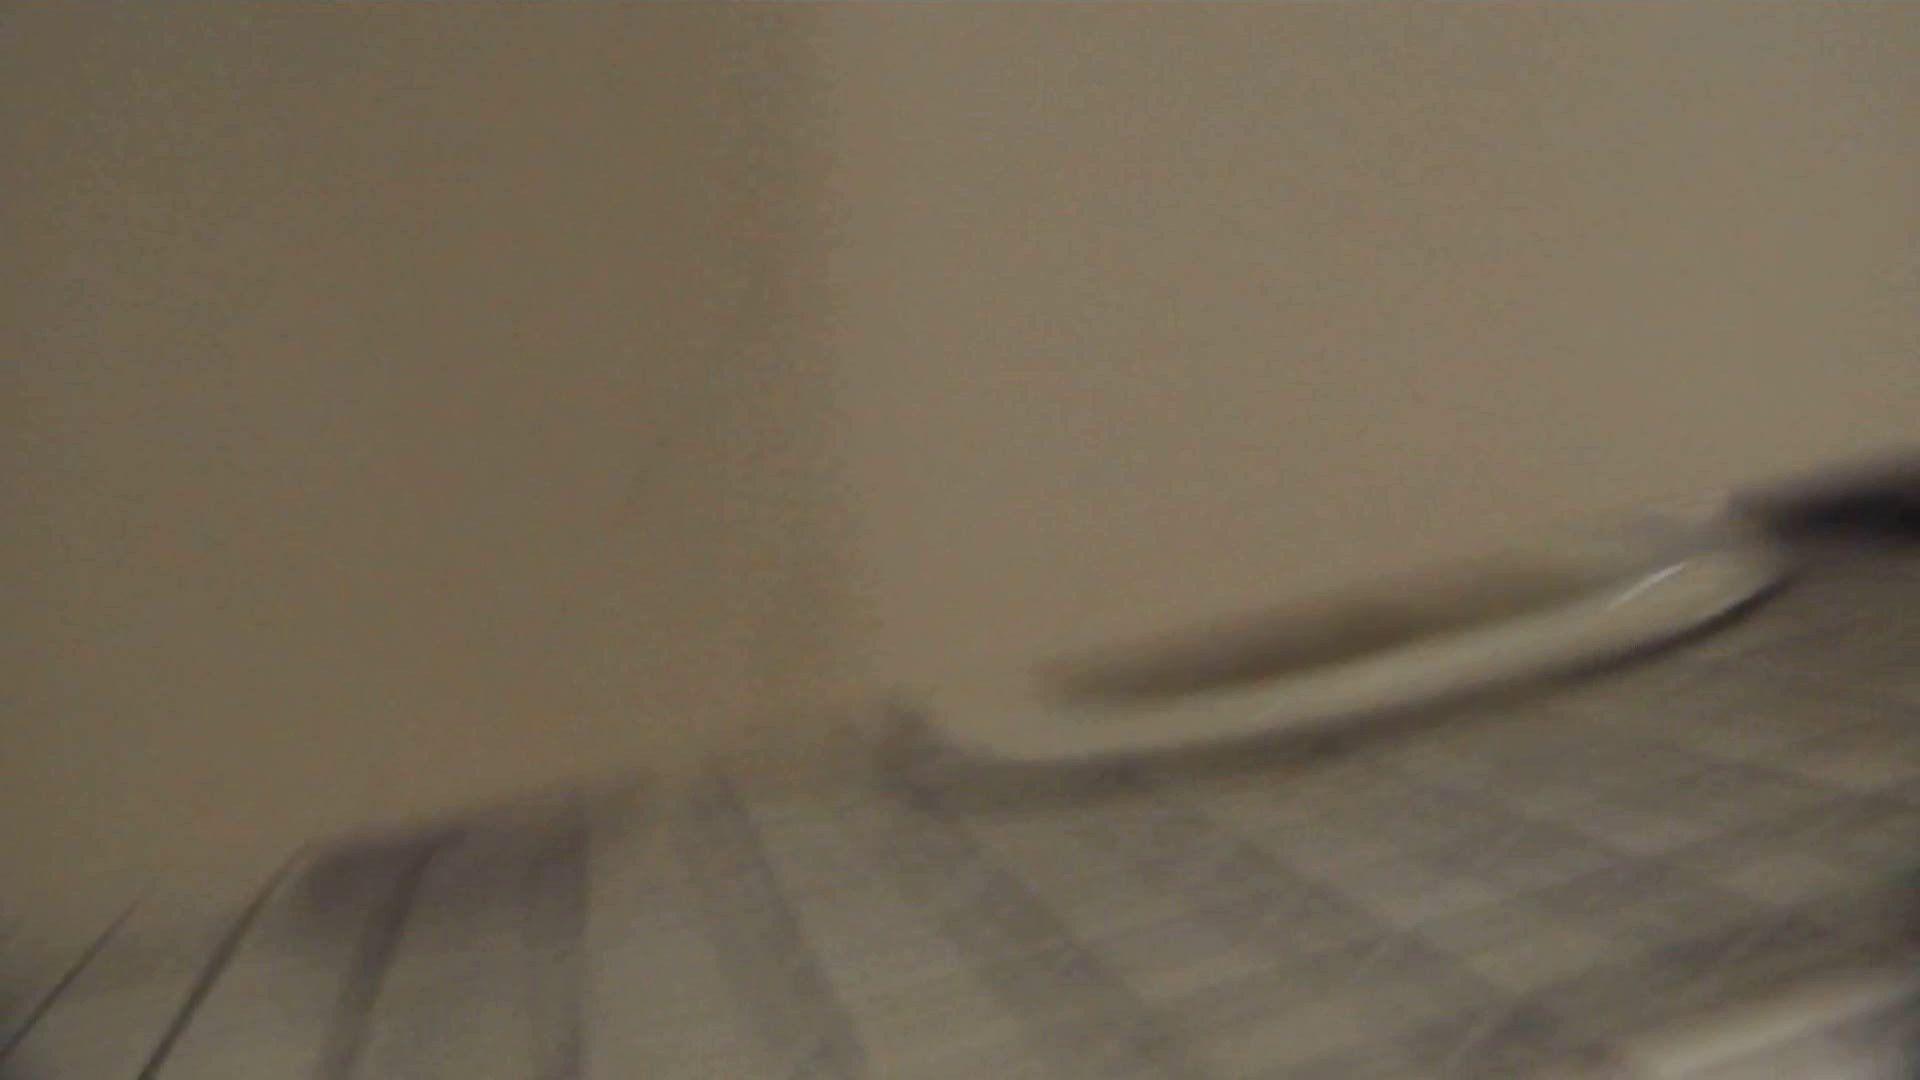 vol.25三十時間潜り、一つしか出会えない完璧桃尻編 byお銀 洗面所  92pic 60